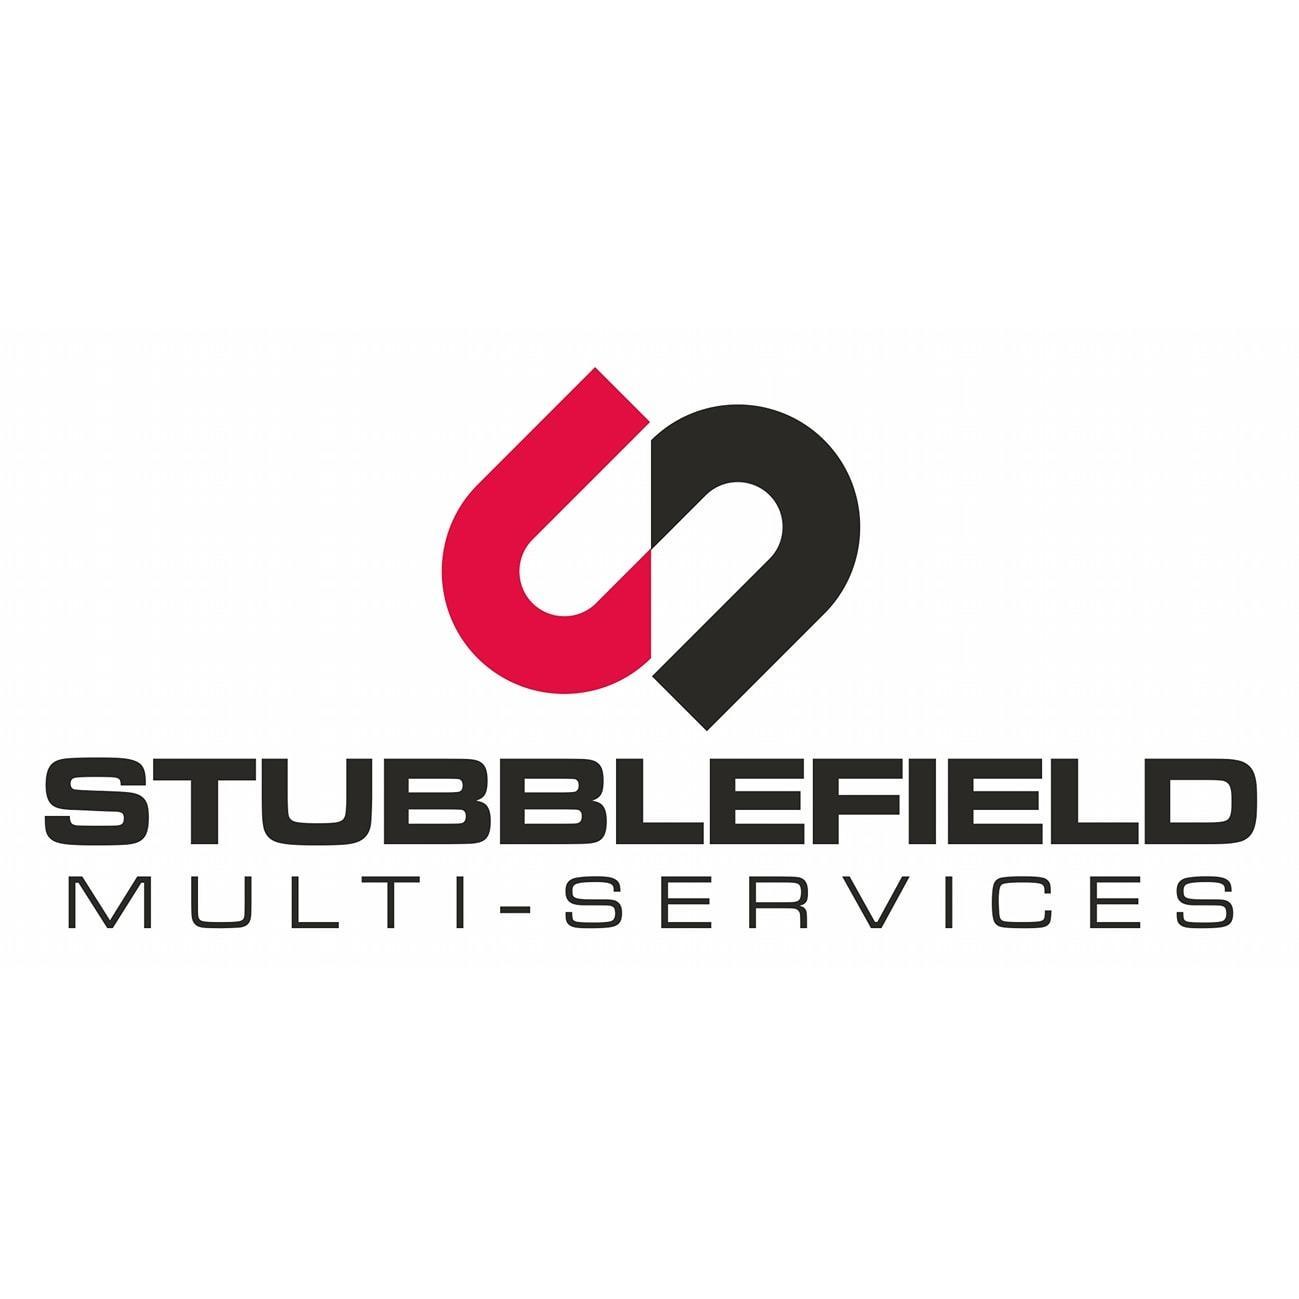 Stubblefield Multi-Services